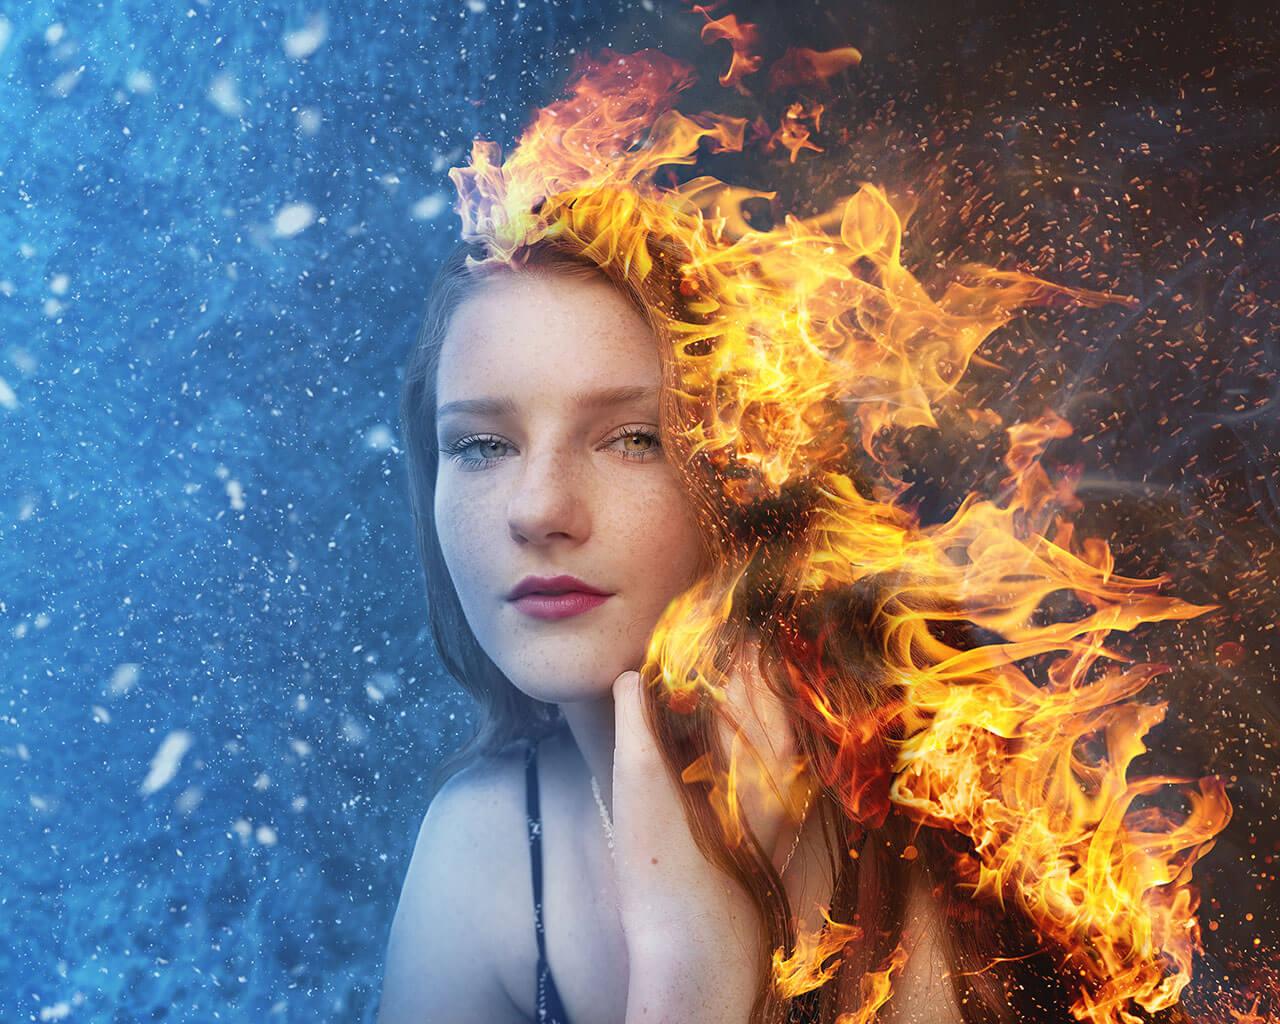 Ice-and-fire-Web.jpg